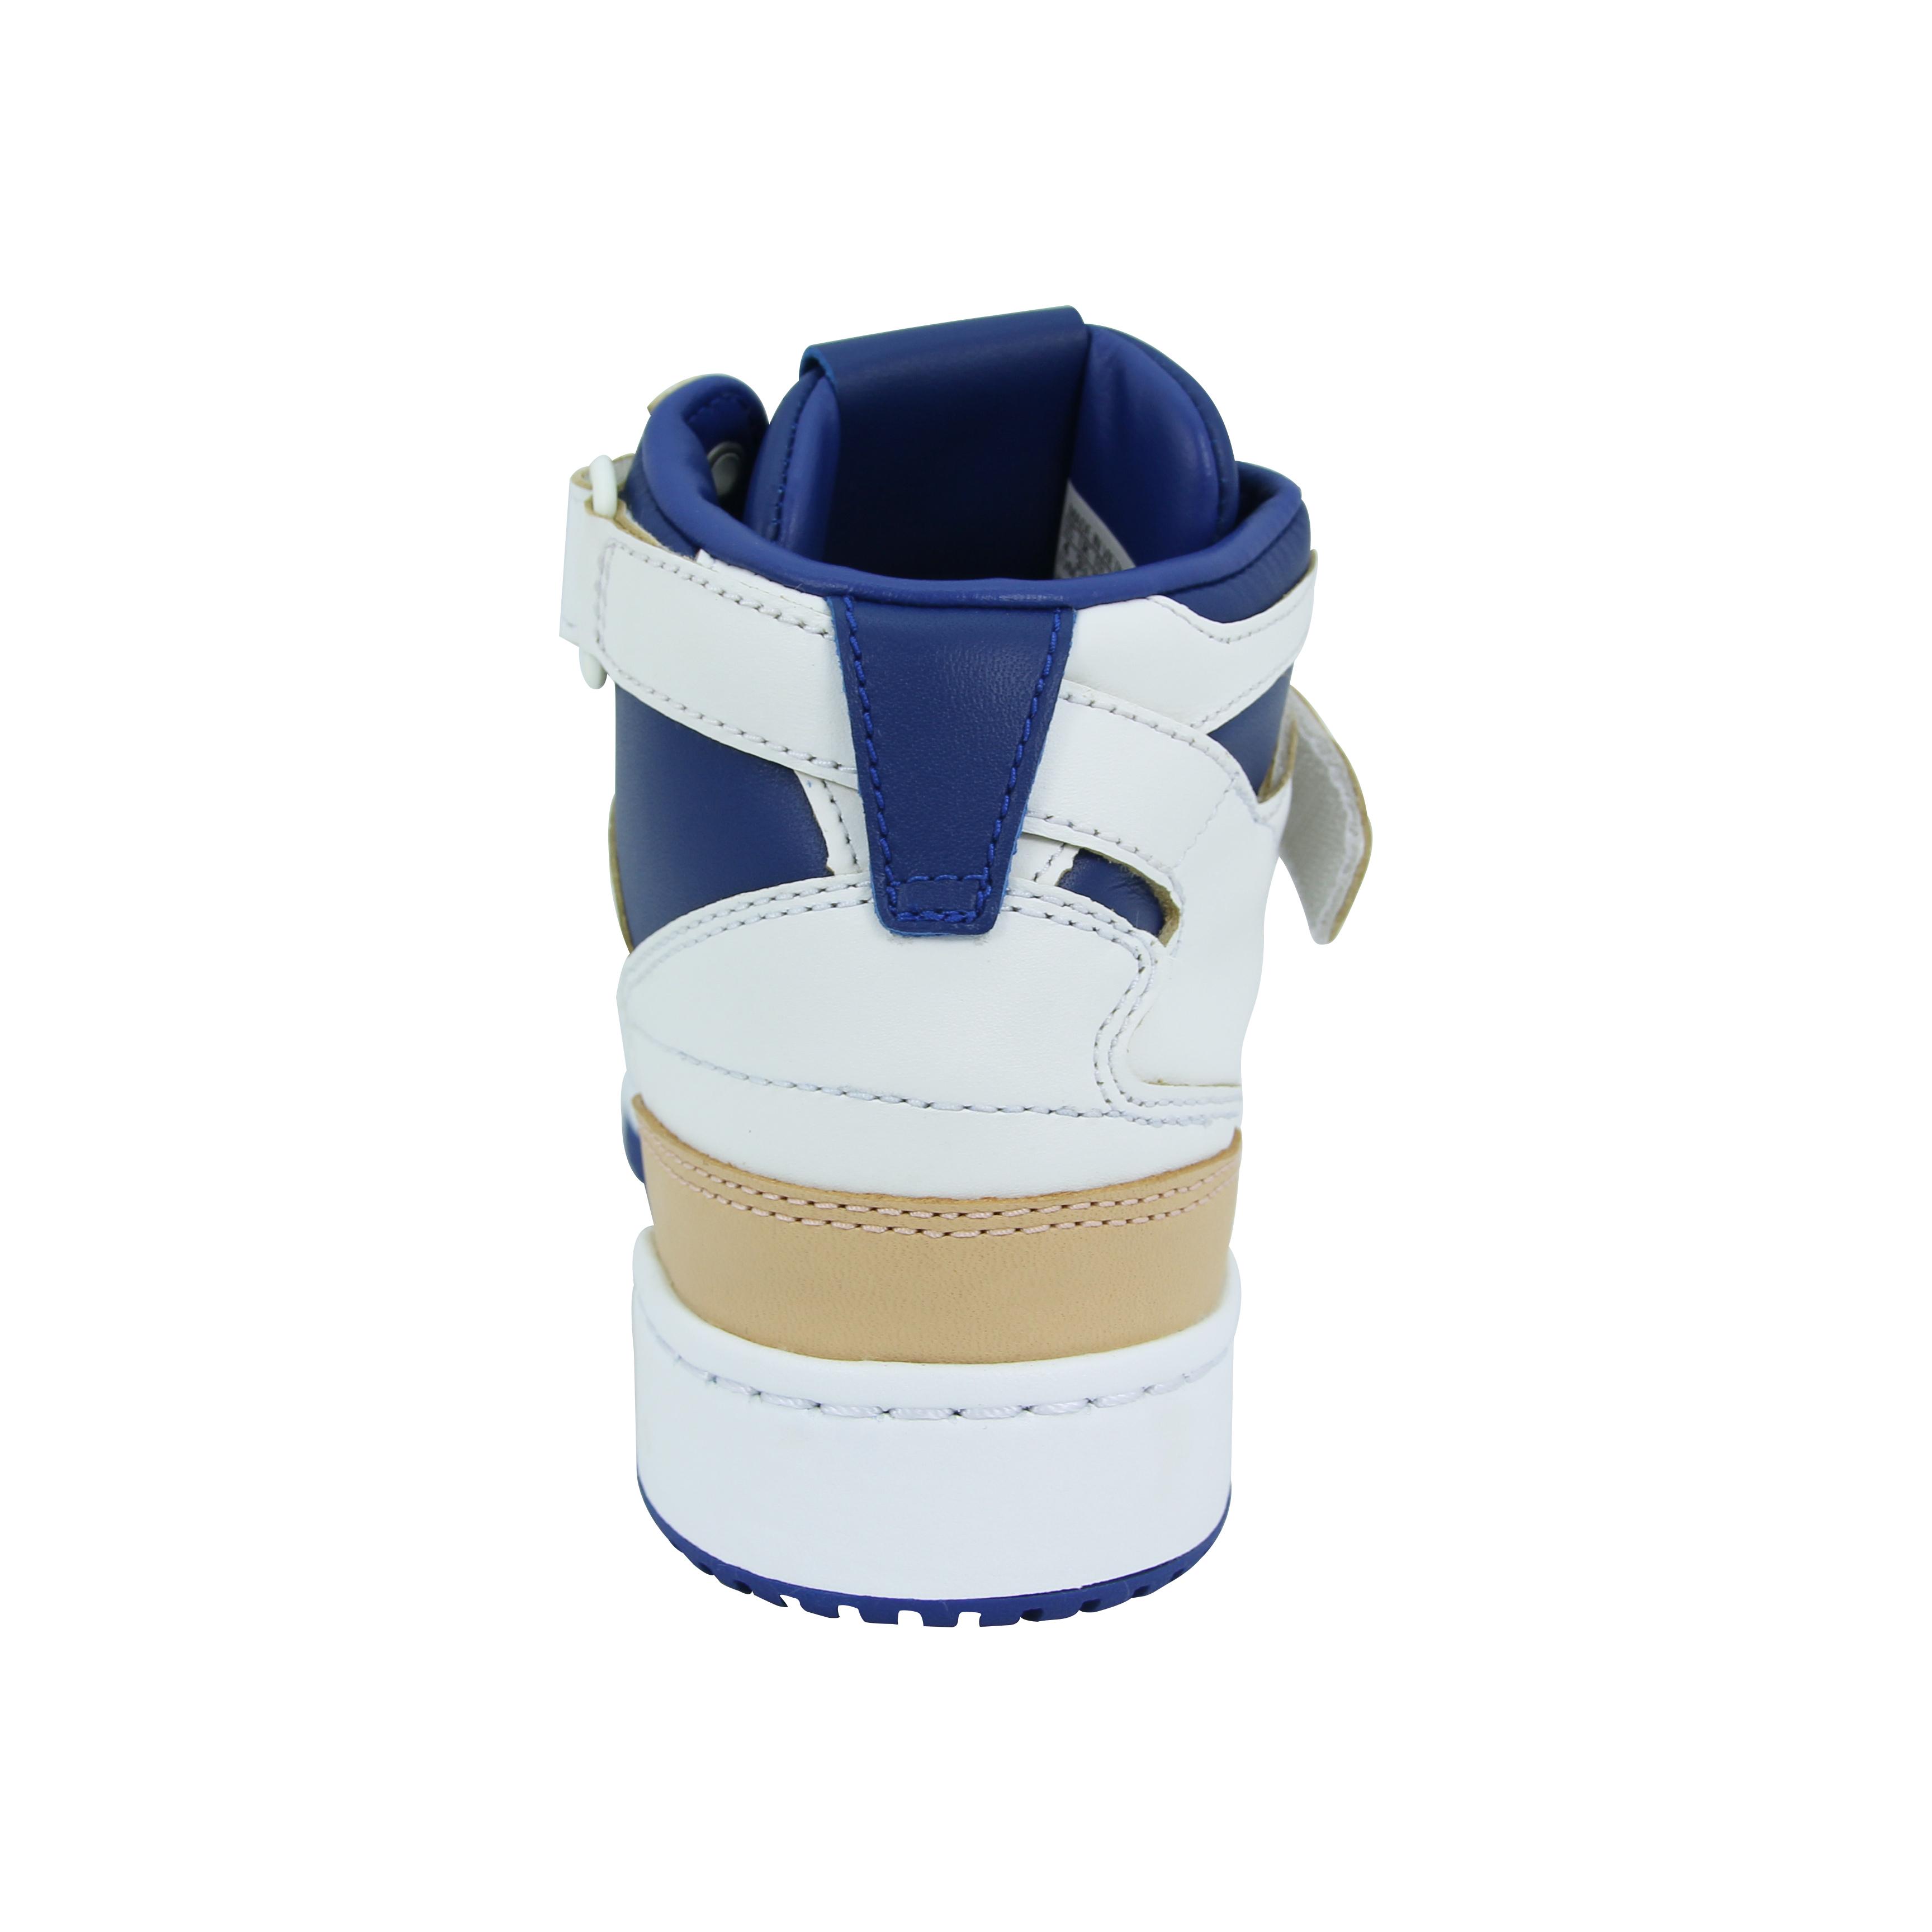 a1b165976166 adidas Originals FORUM MEDIO WRAP Pelle Scarpe Moda Scarpe sportive Uomo 4  4 di 6 ...